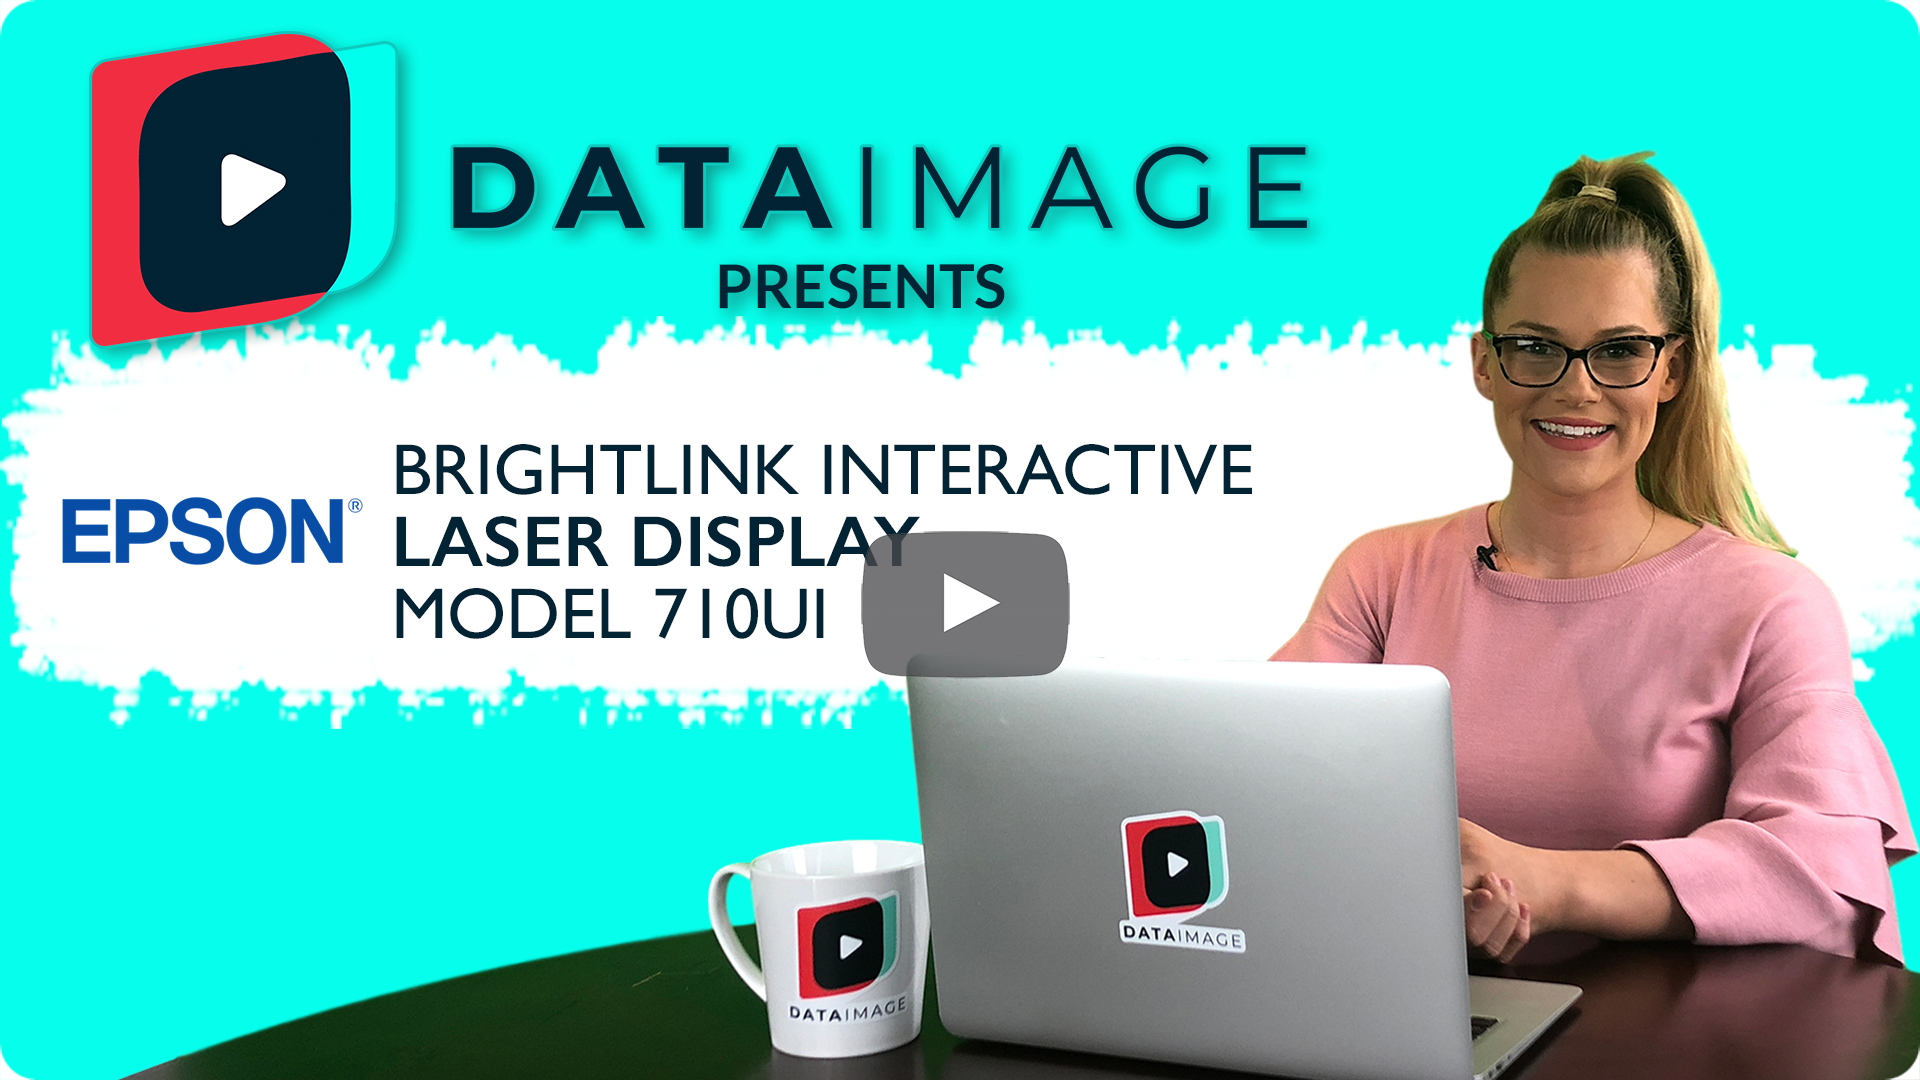 Epson Brightlink Interactive Laser Display 710Ui Video Cover